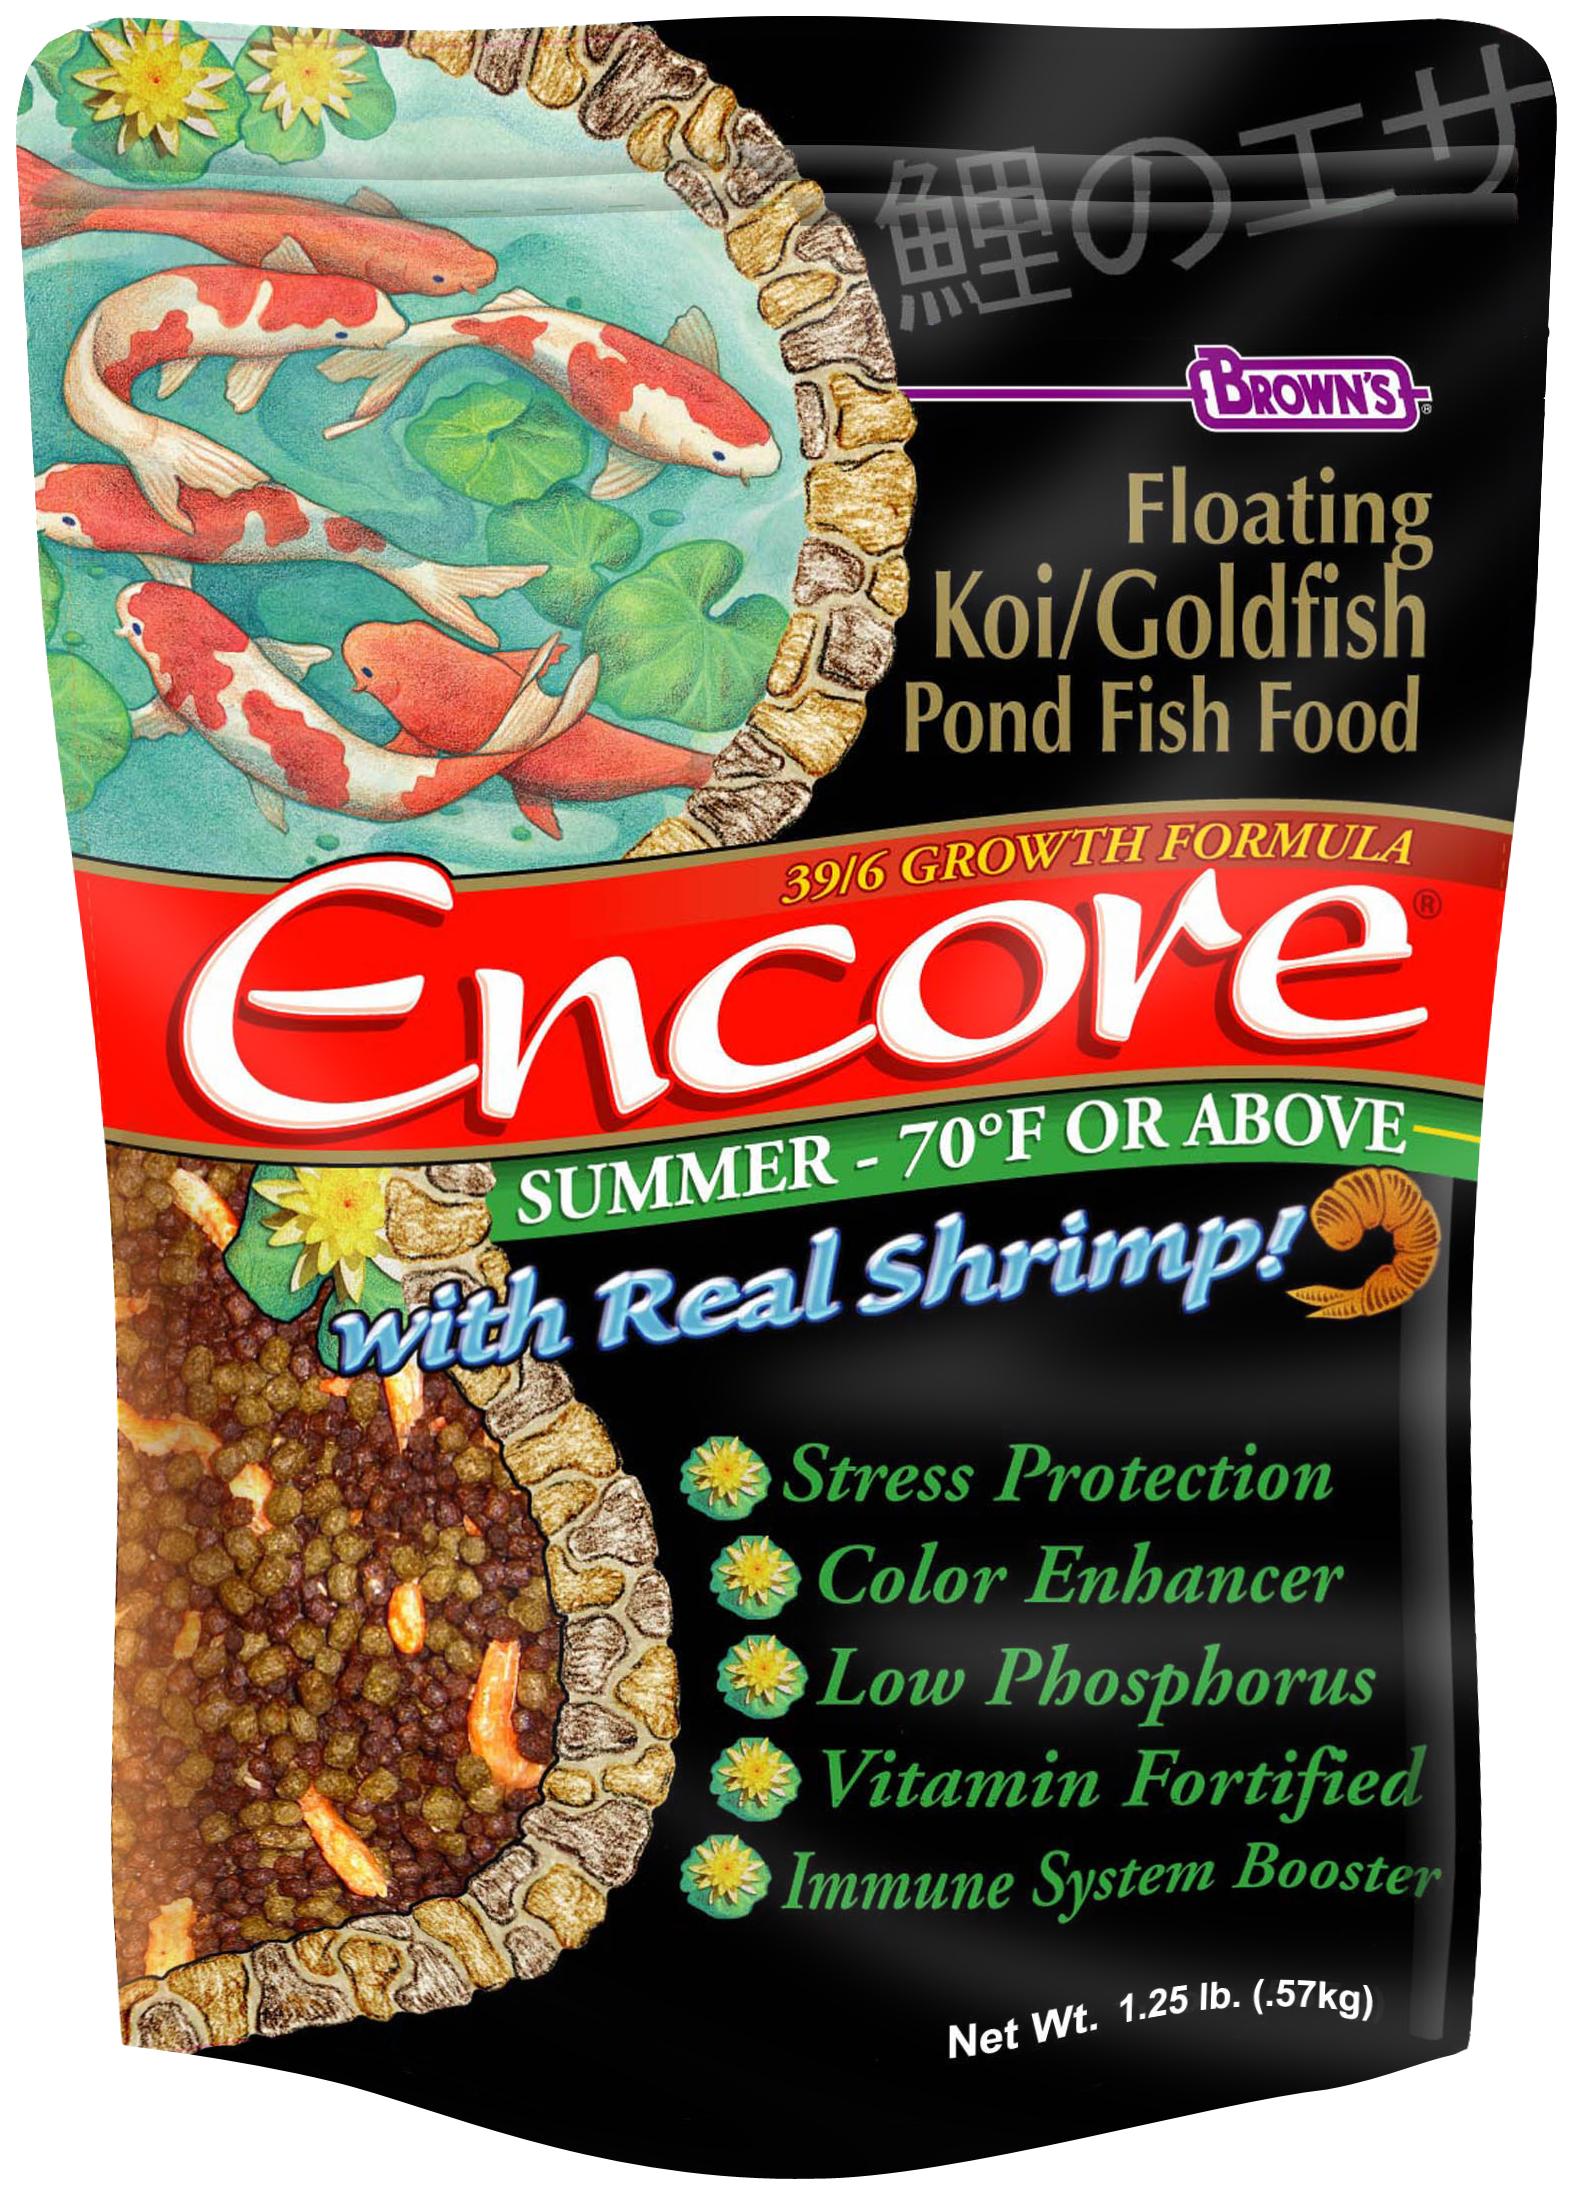 Encore® Floating Koi/Goldfish Pond Fish Food (Summer) | F.M. Brown\'s